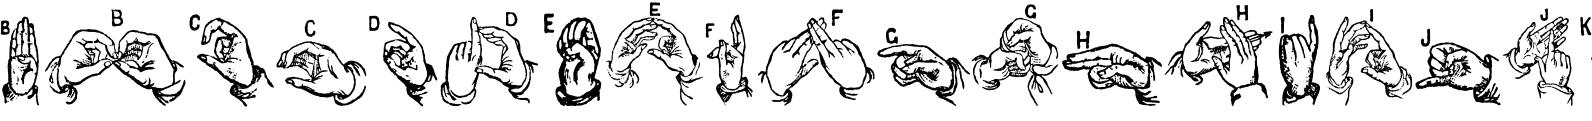 ABC Hand